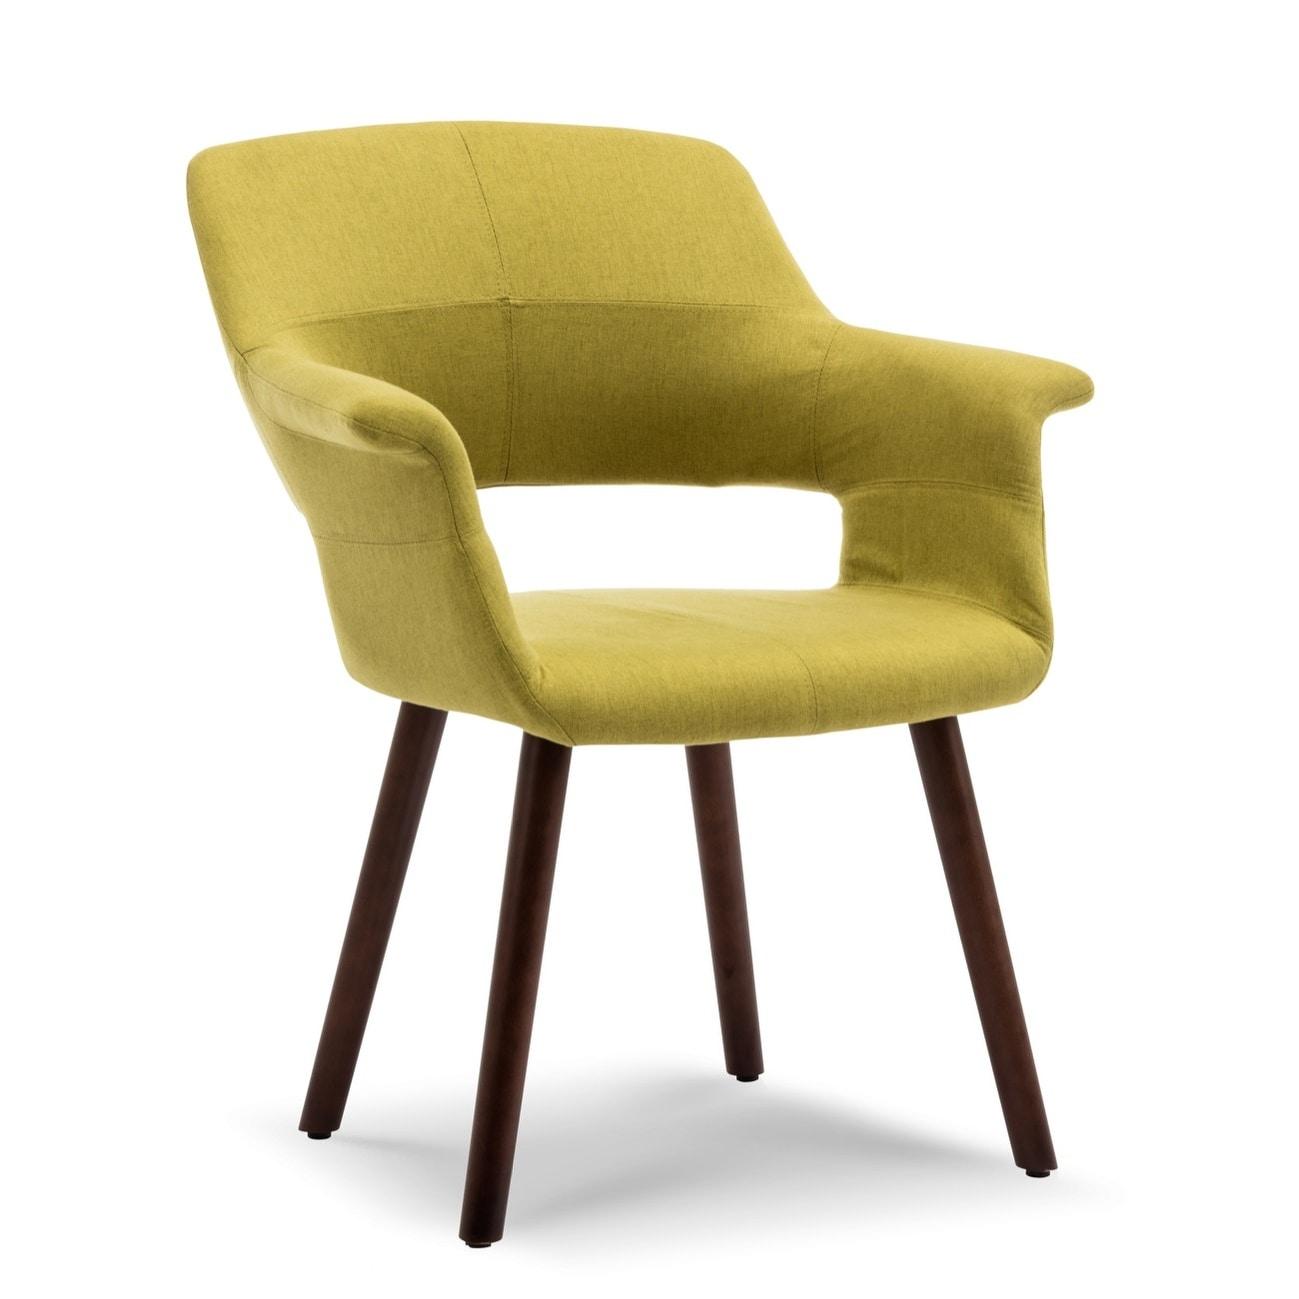 Belleze Dining Chair Accent Mid Century Linen Armrest Padded Wooden Legs